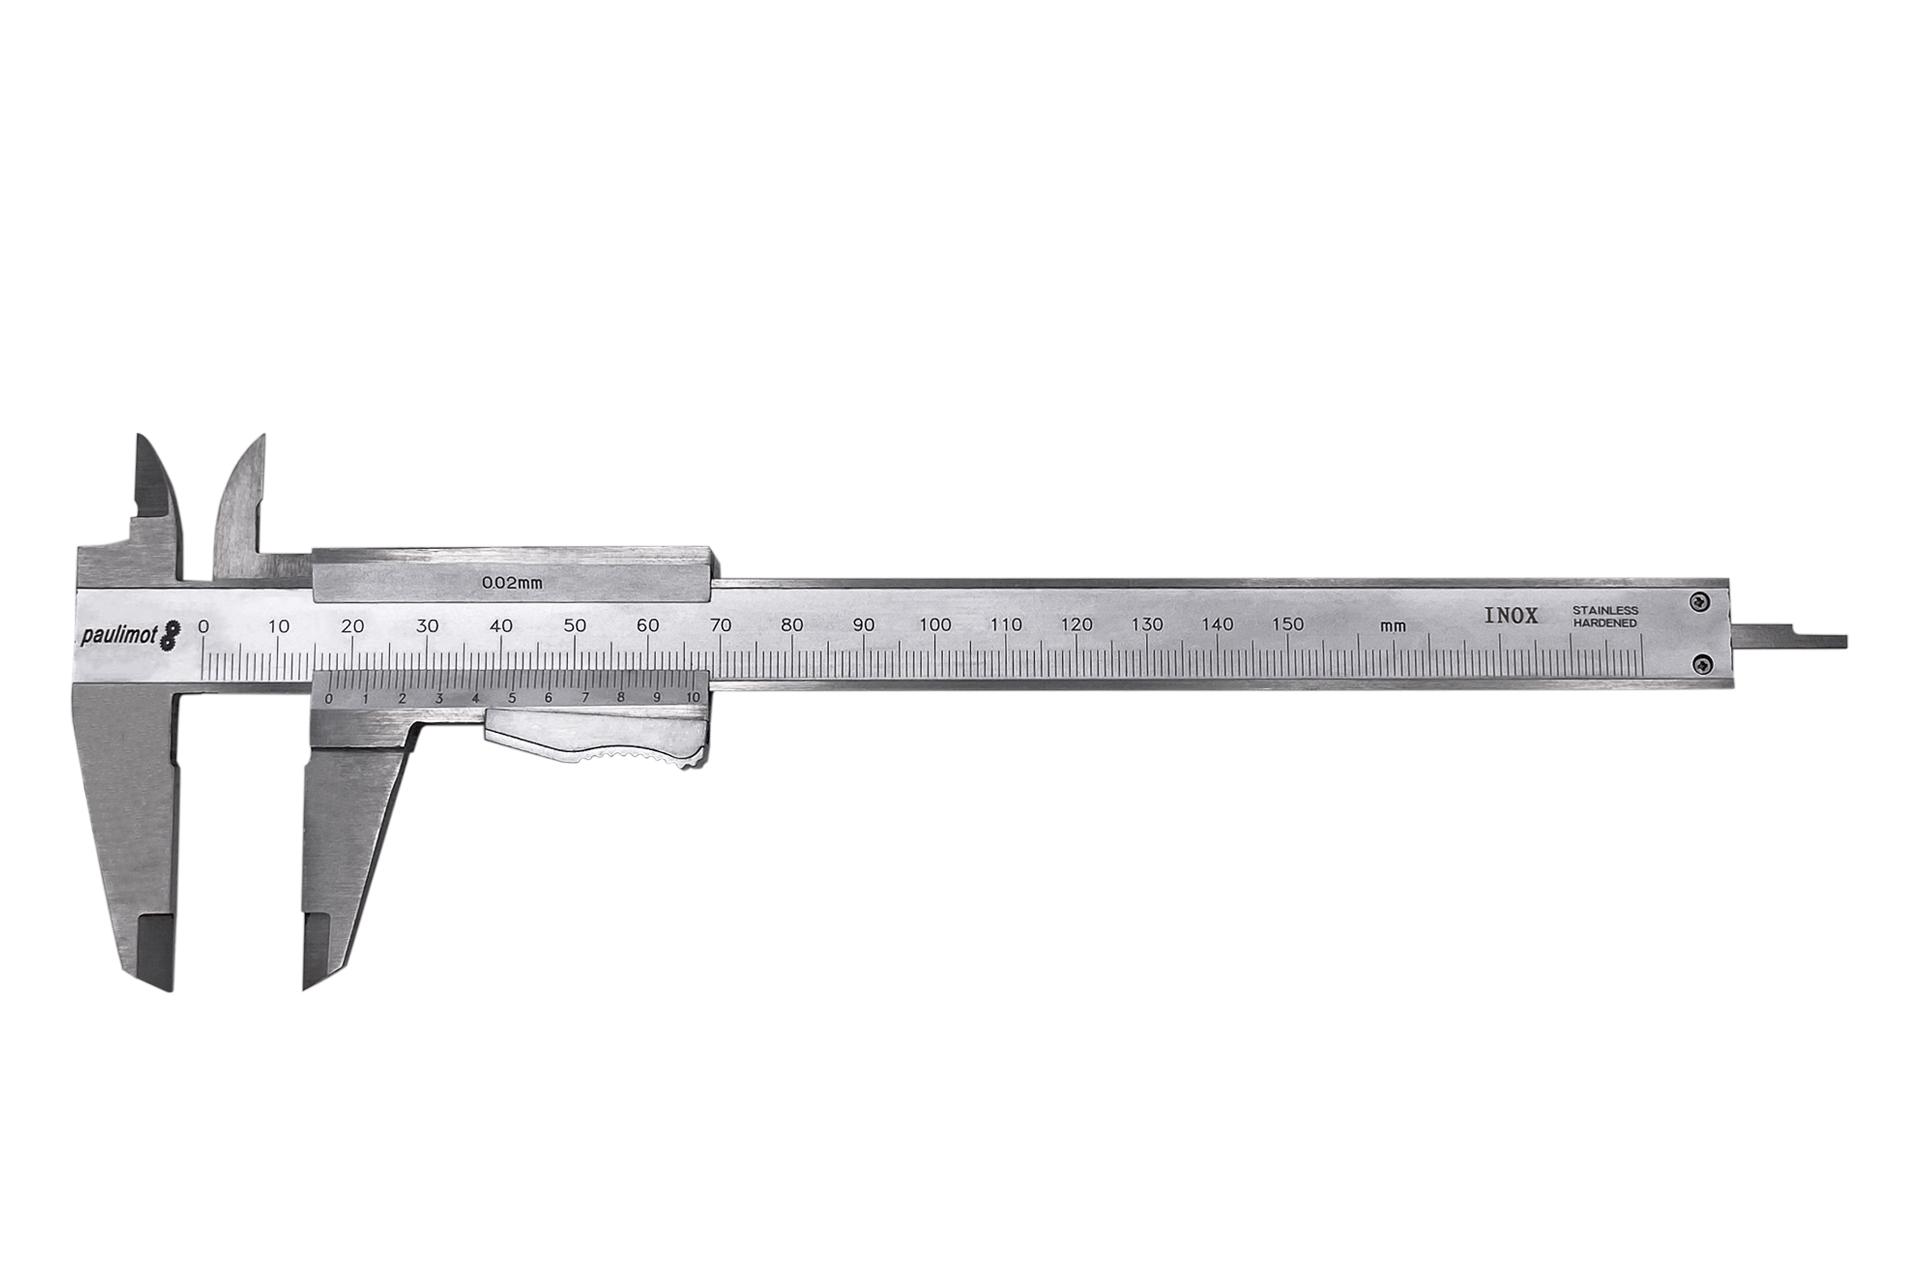 PAULIMOT Messschieber digital 0-150 mm rostfrei INOX IP54